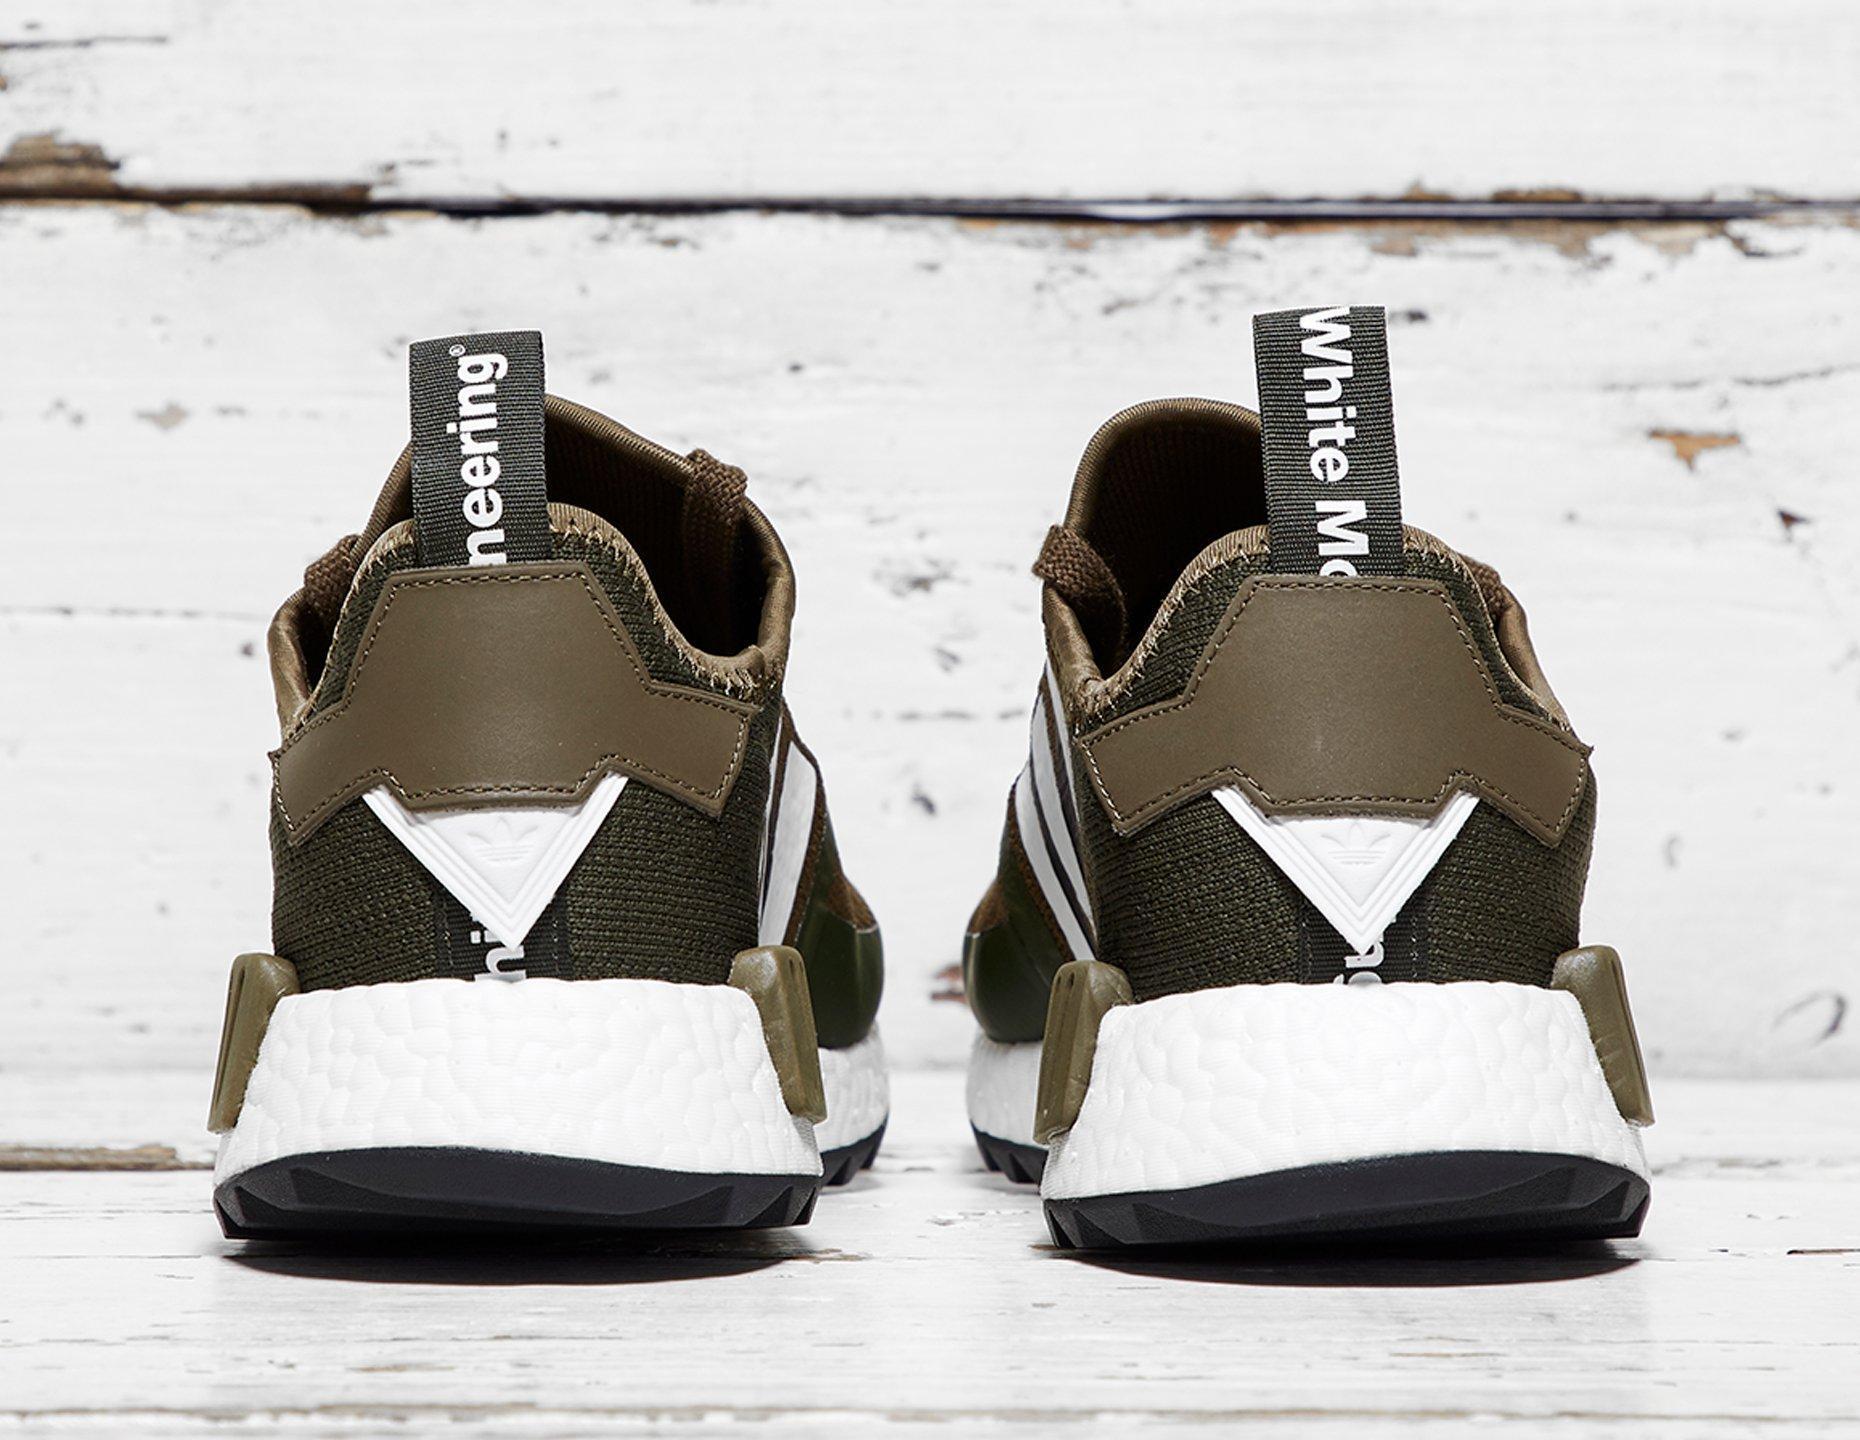 premium selection 73525 a9c28 Lyst - Adidas Originals X White Mountaineering Nmd Trail Pri